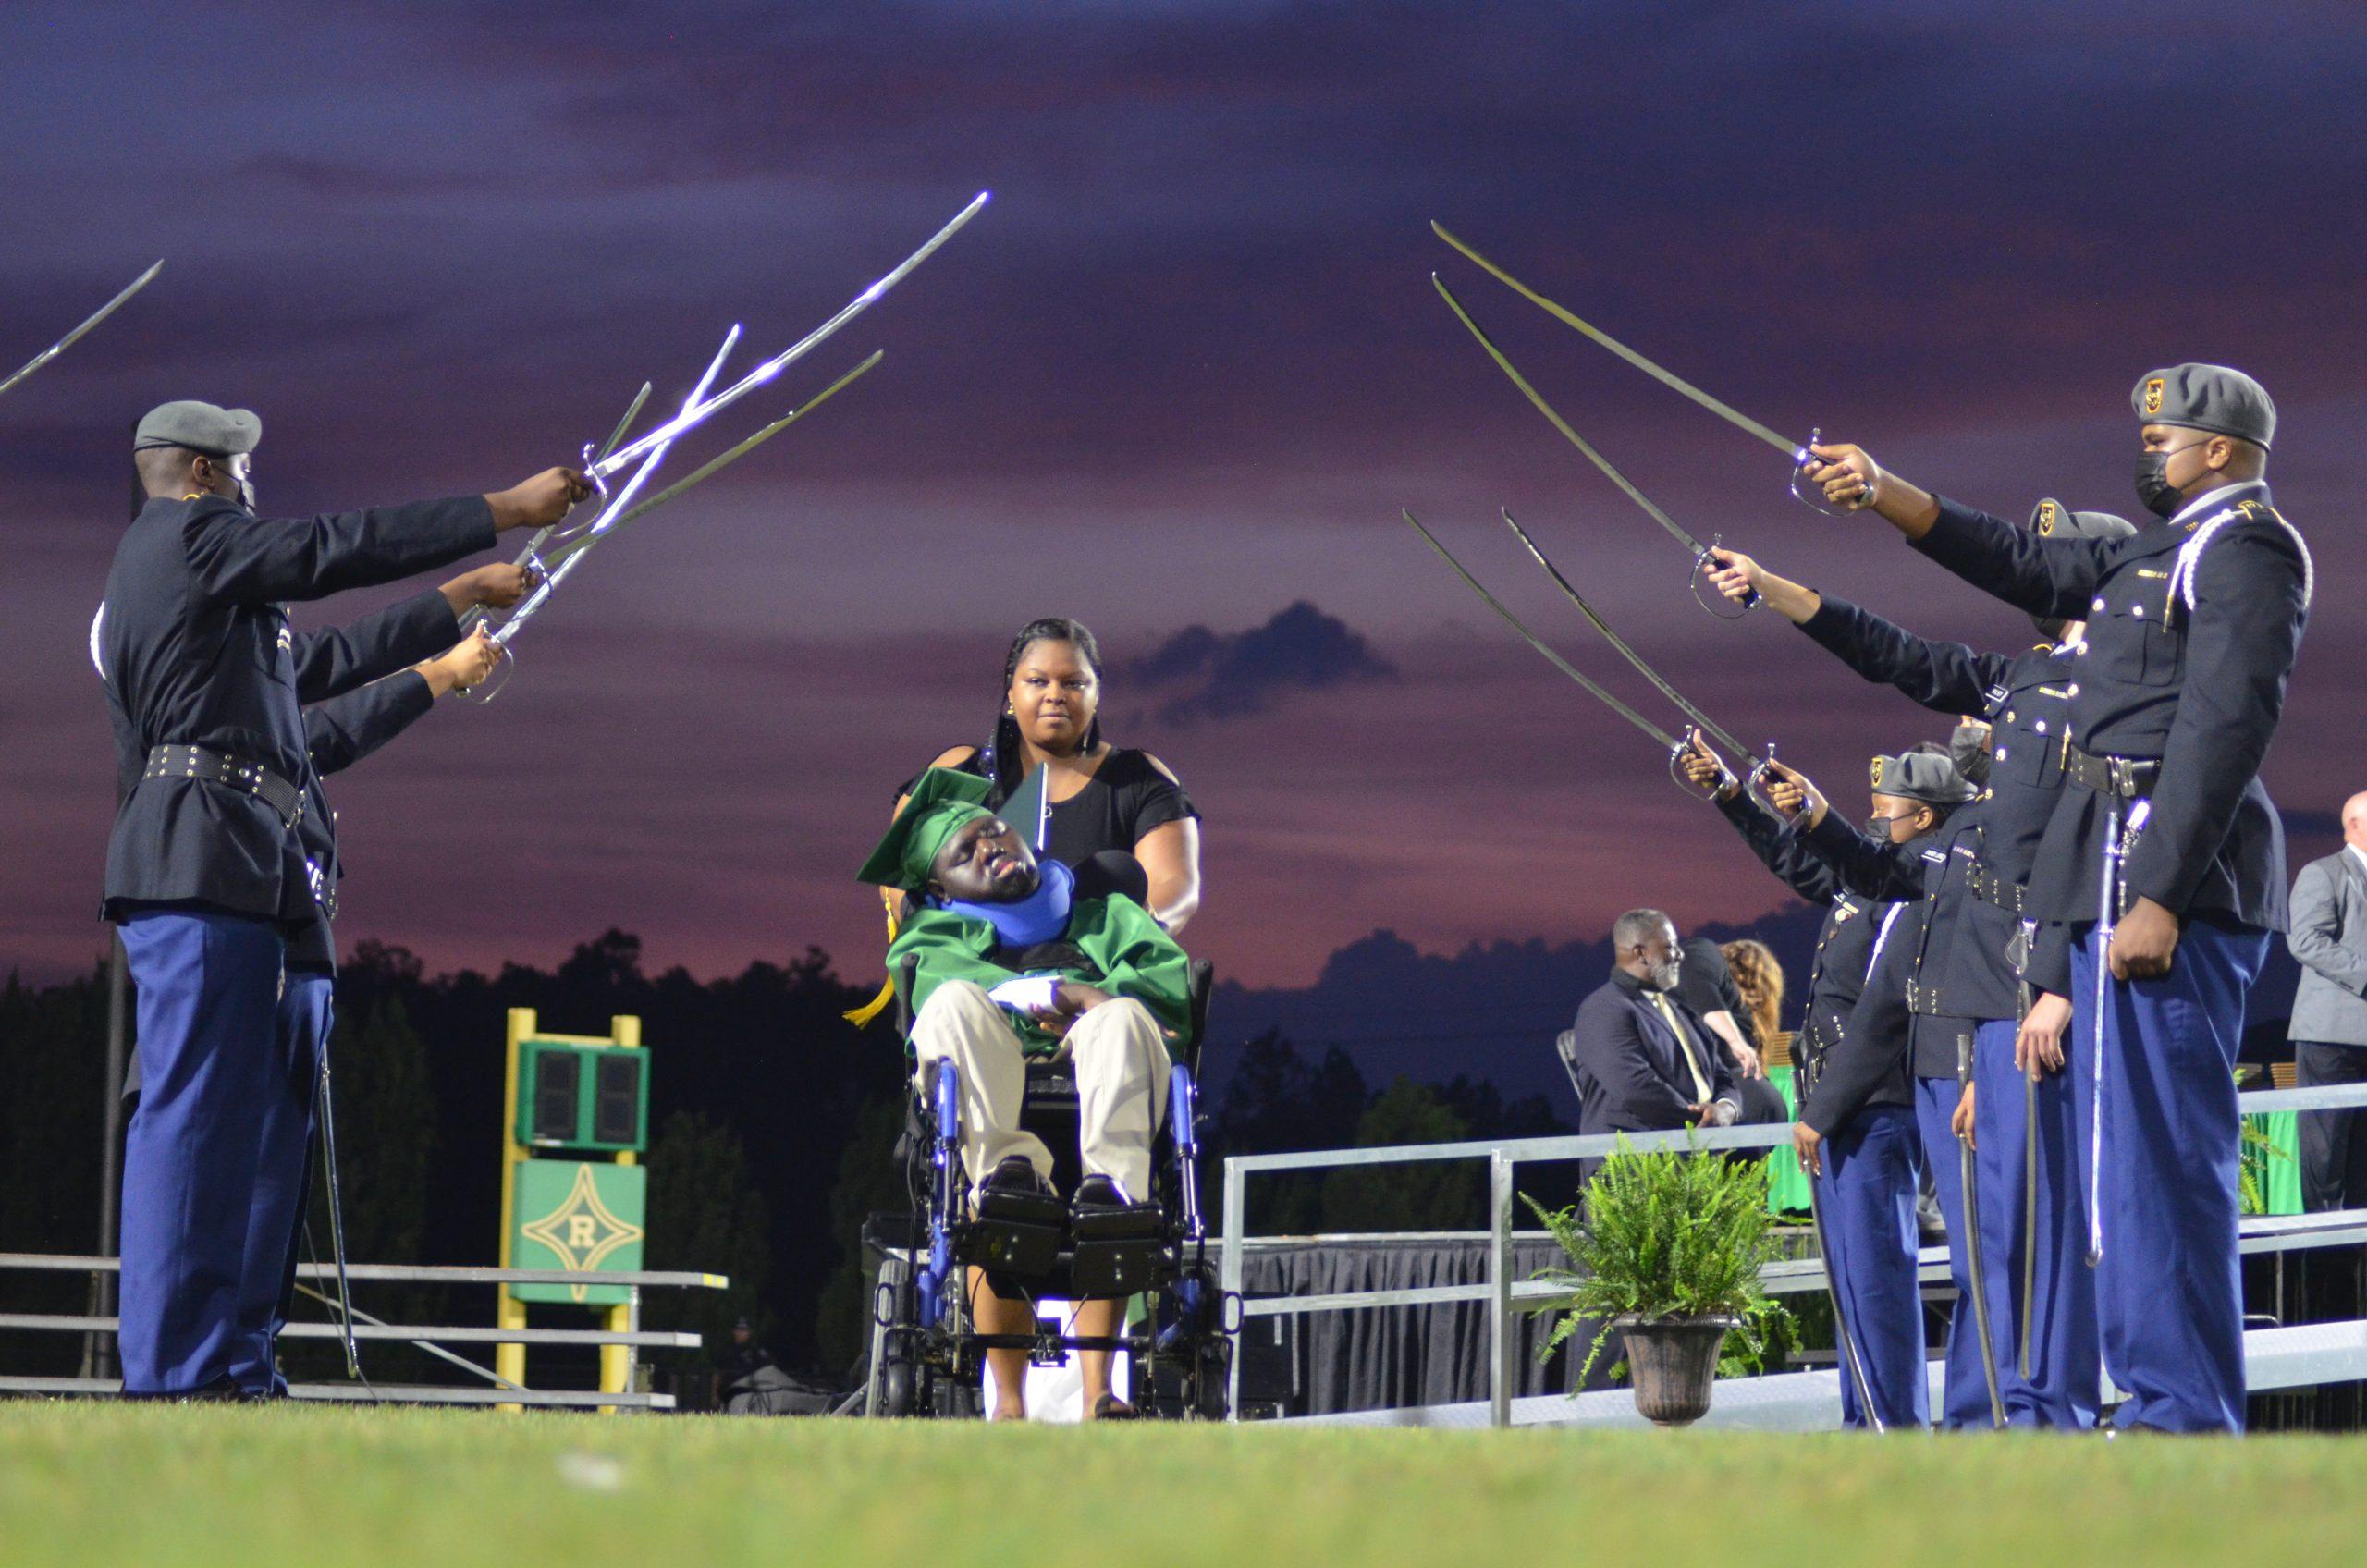 Timothy Bethea, dressed in green cap and gown, is accompanied by teacher Takia York at Richmond Senior High School's Raider Stadium.